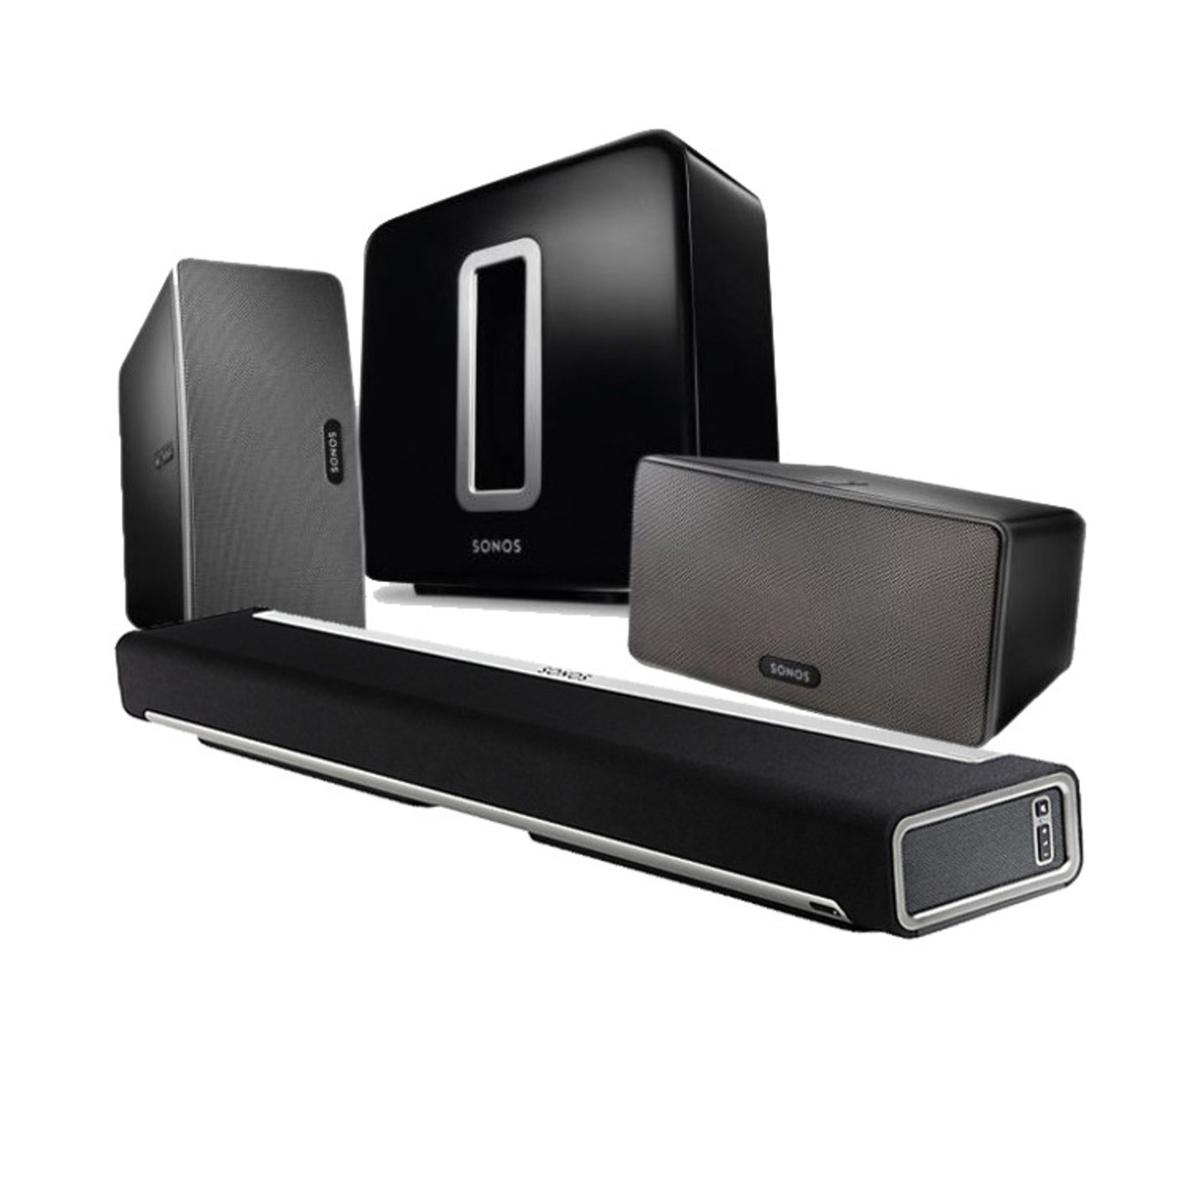 sonos heimkino 5 1 sonos 5 1 heimkino small hidden audio. Black Bedroom Furniture Sets. Home Design Ideas